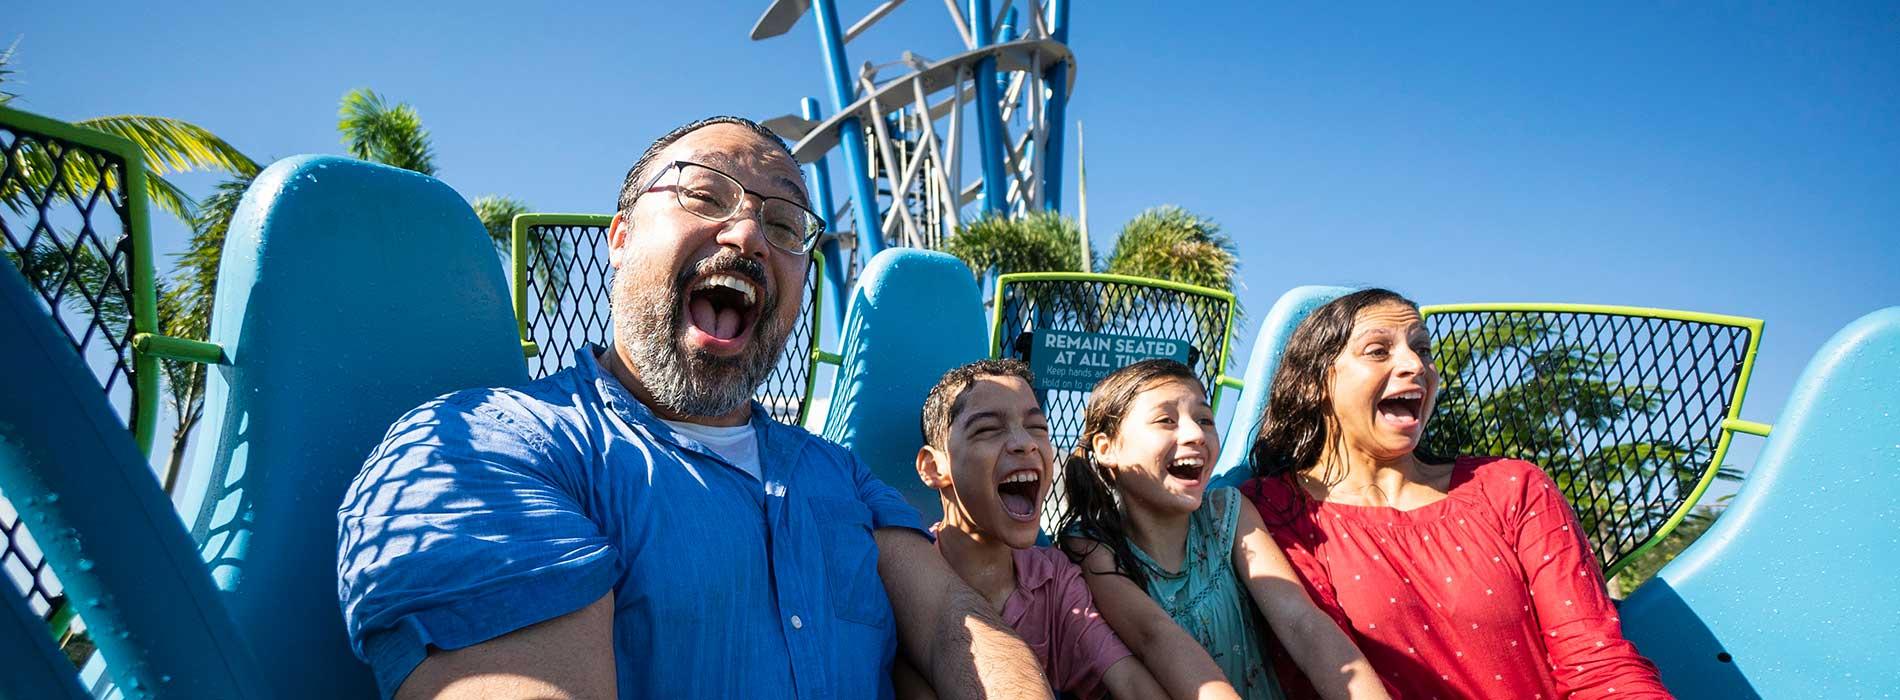 Experience Infinity Falls at SeaWorld Orlando